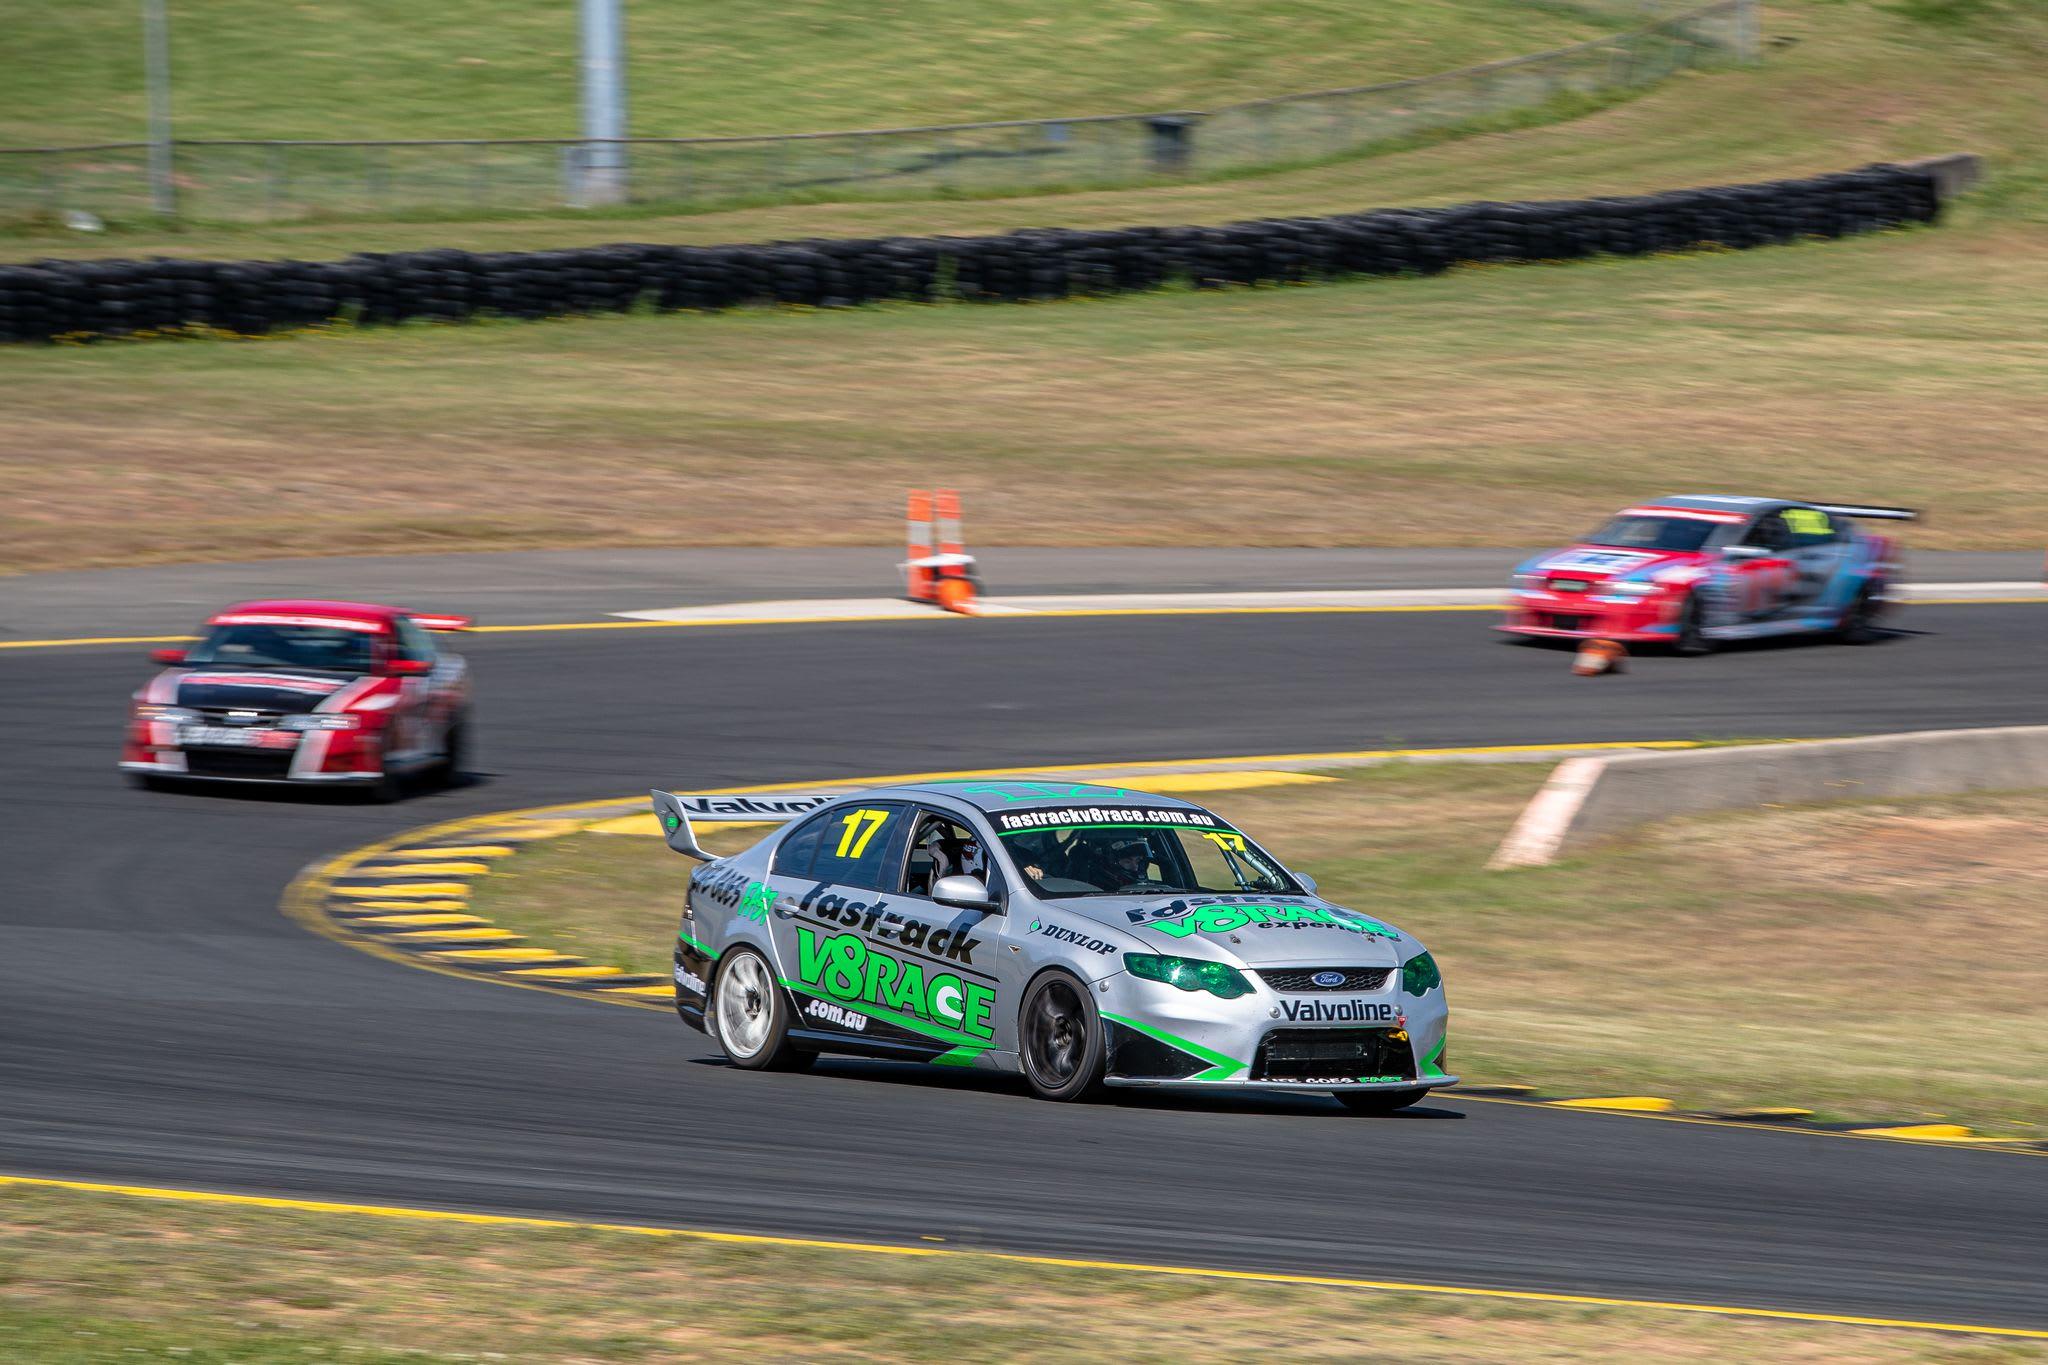 V8 Race Car 6 Lap Drive - Hidden Valley, Darwin